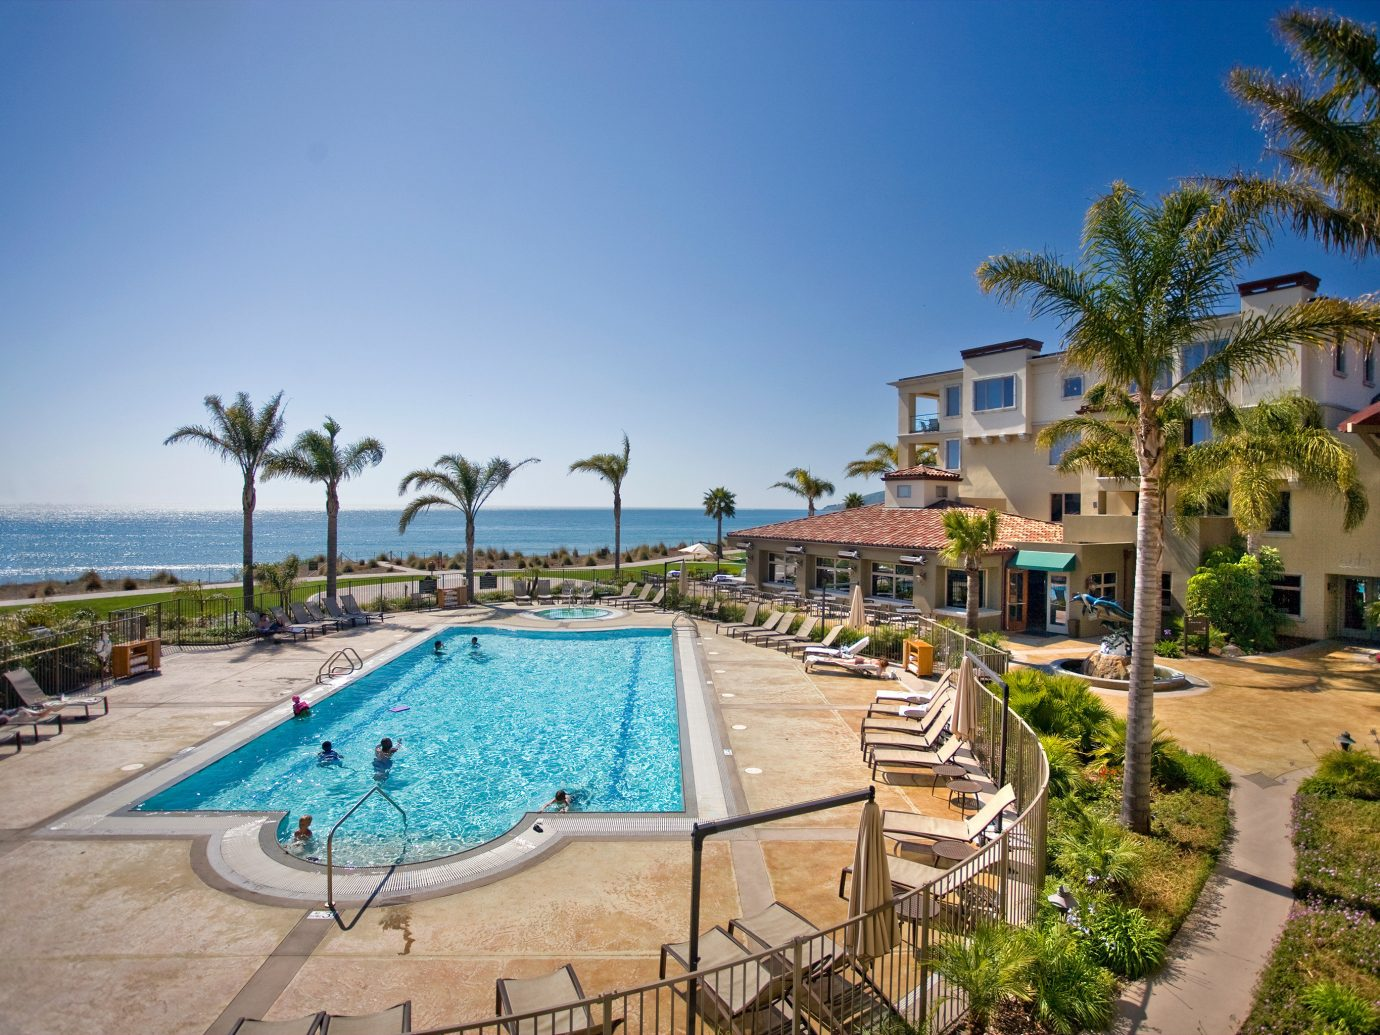 Hotels sky outdoor ground swimming pool property leisure Resort estate vacation Beach Villa real estate caribbean condominium lined Deck shore sandy